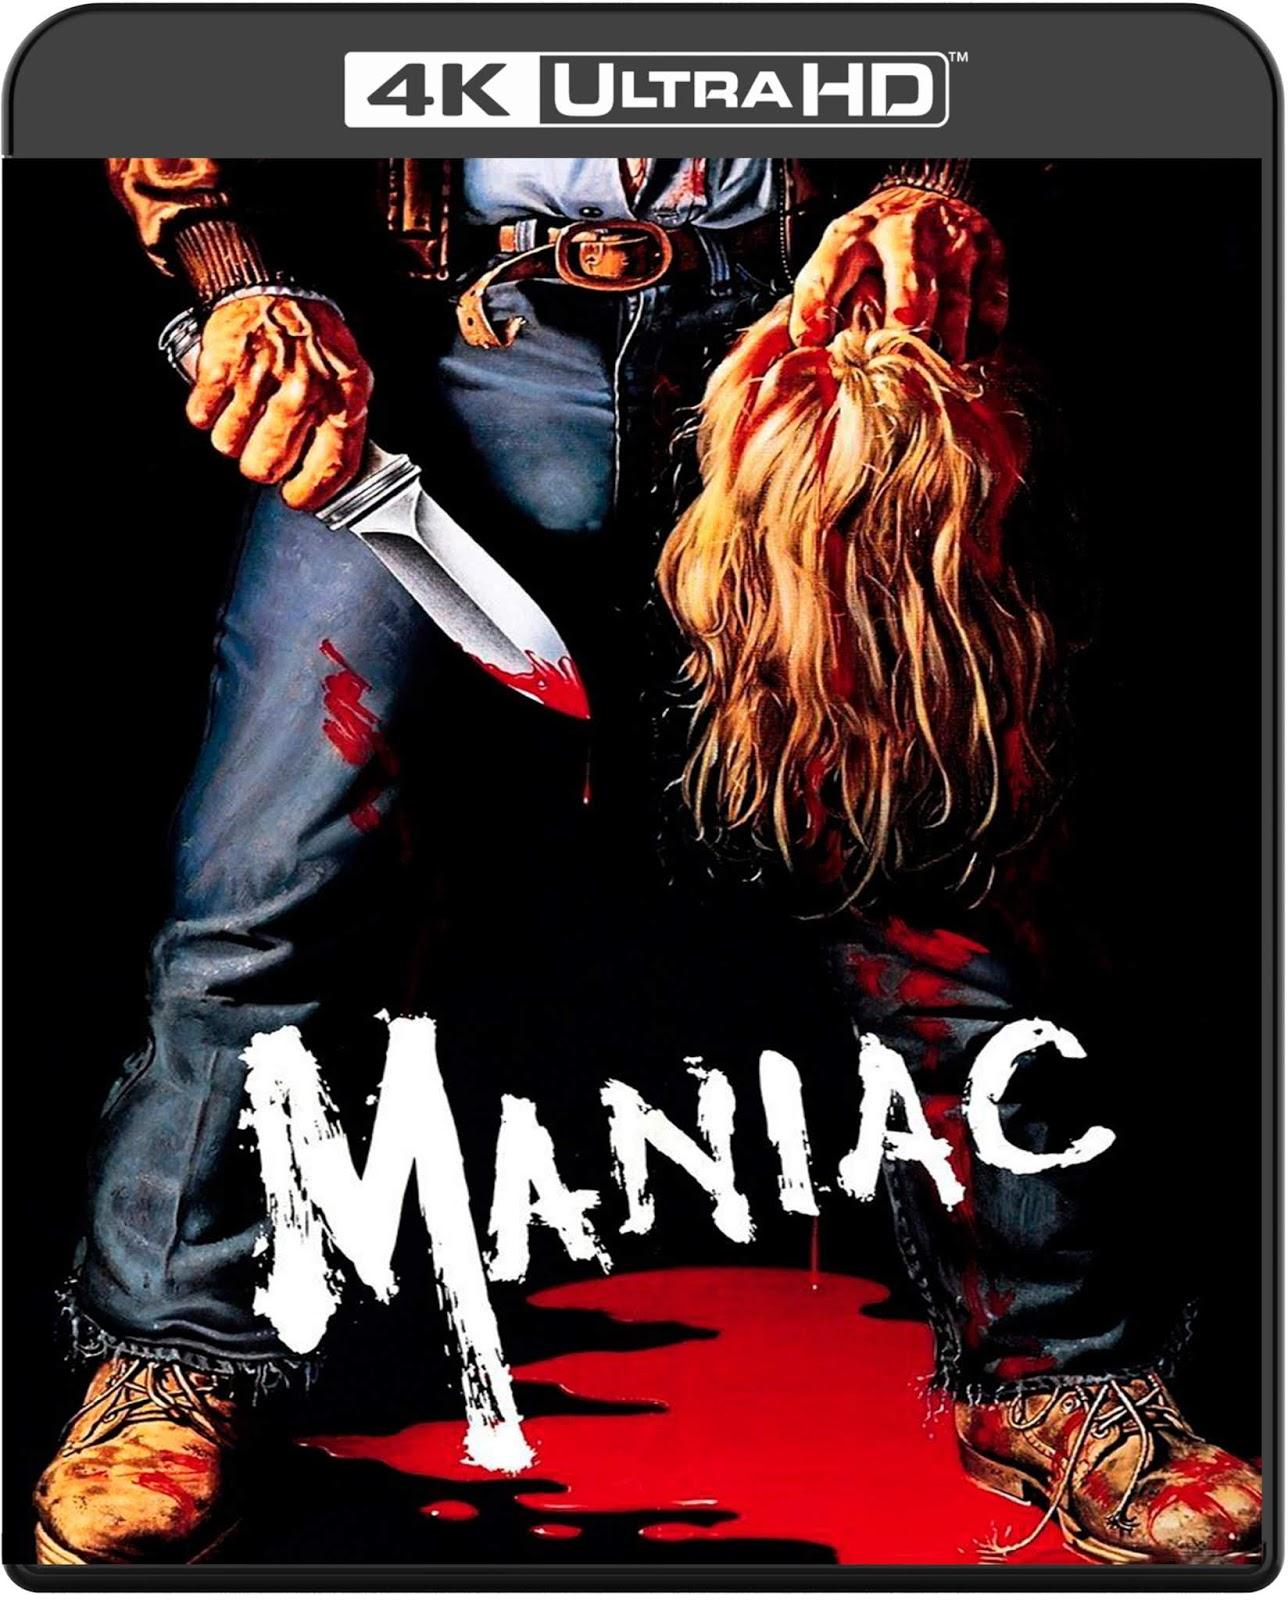 Maniac [1980] [UHD] [2160p] [Castellano]